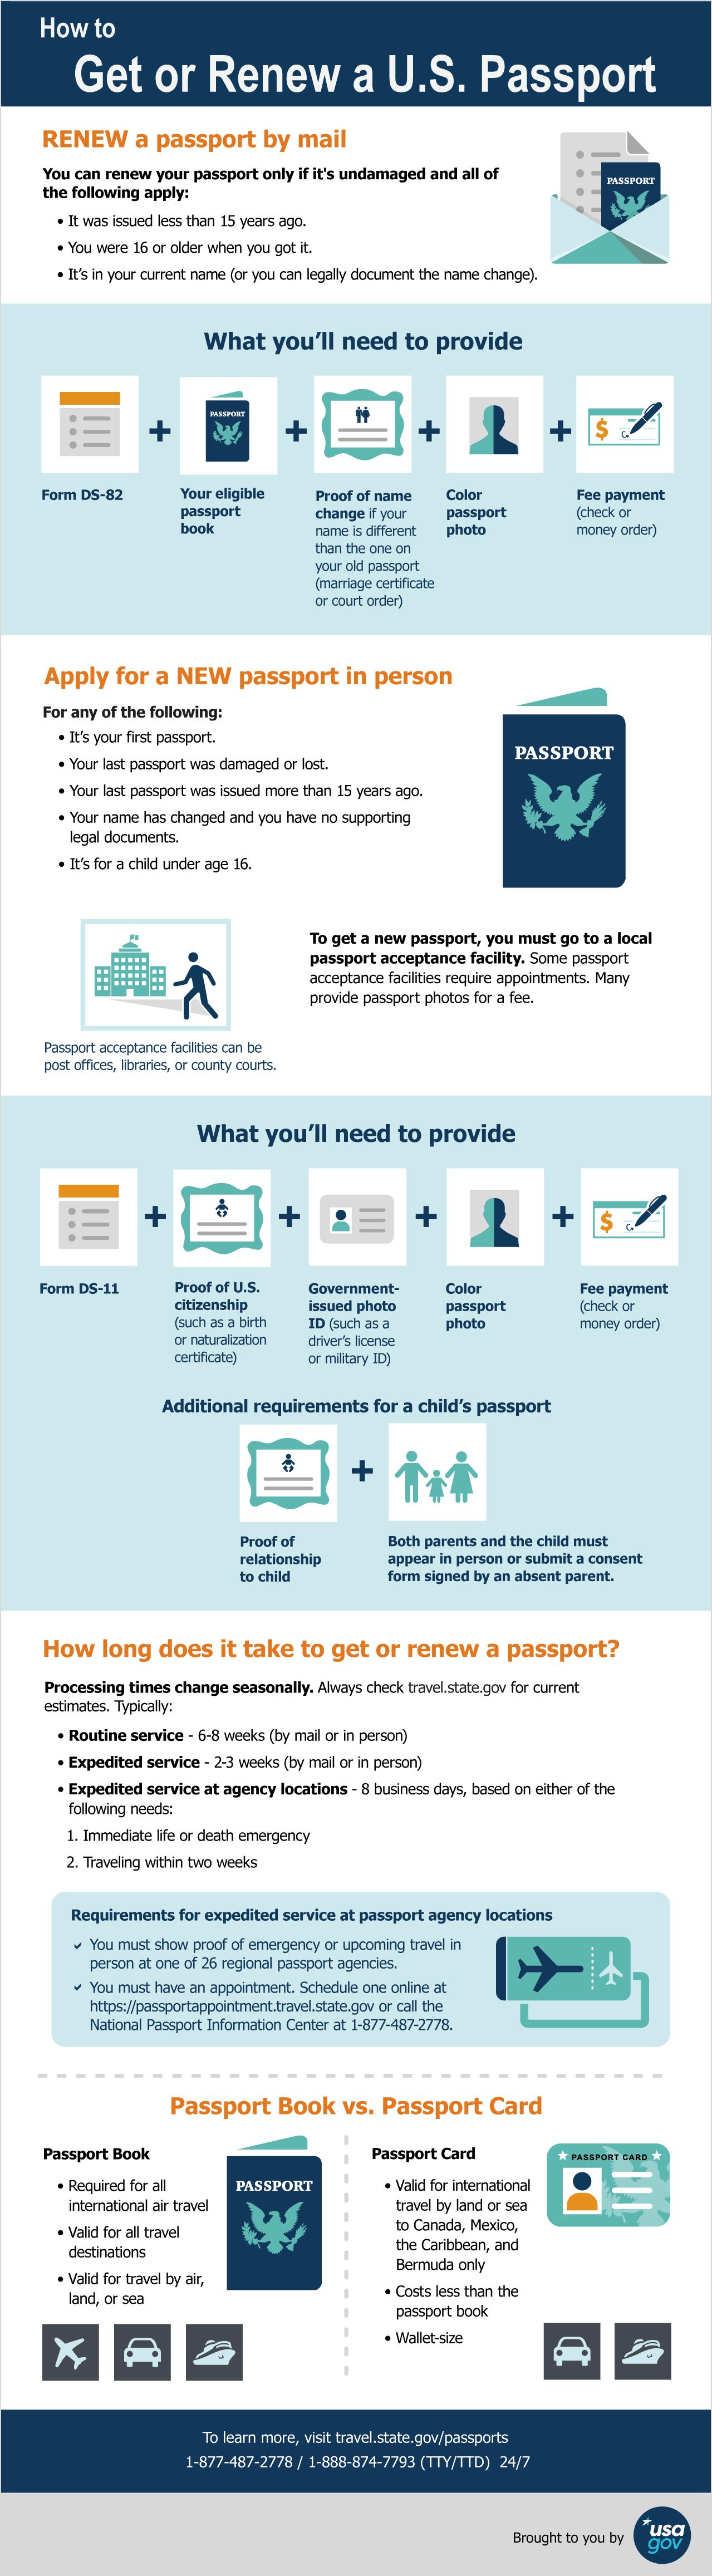 Getting or Renewing a U.S. Passport | USAGov